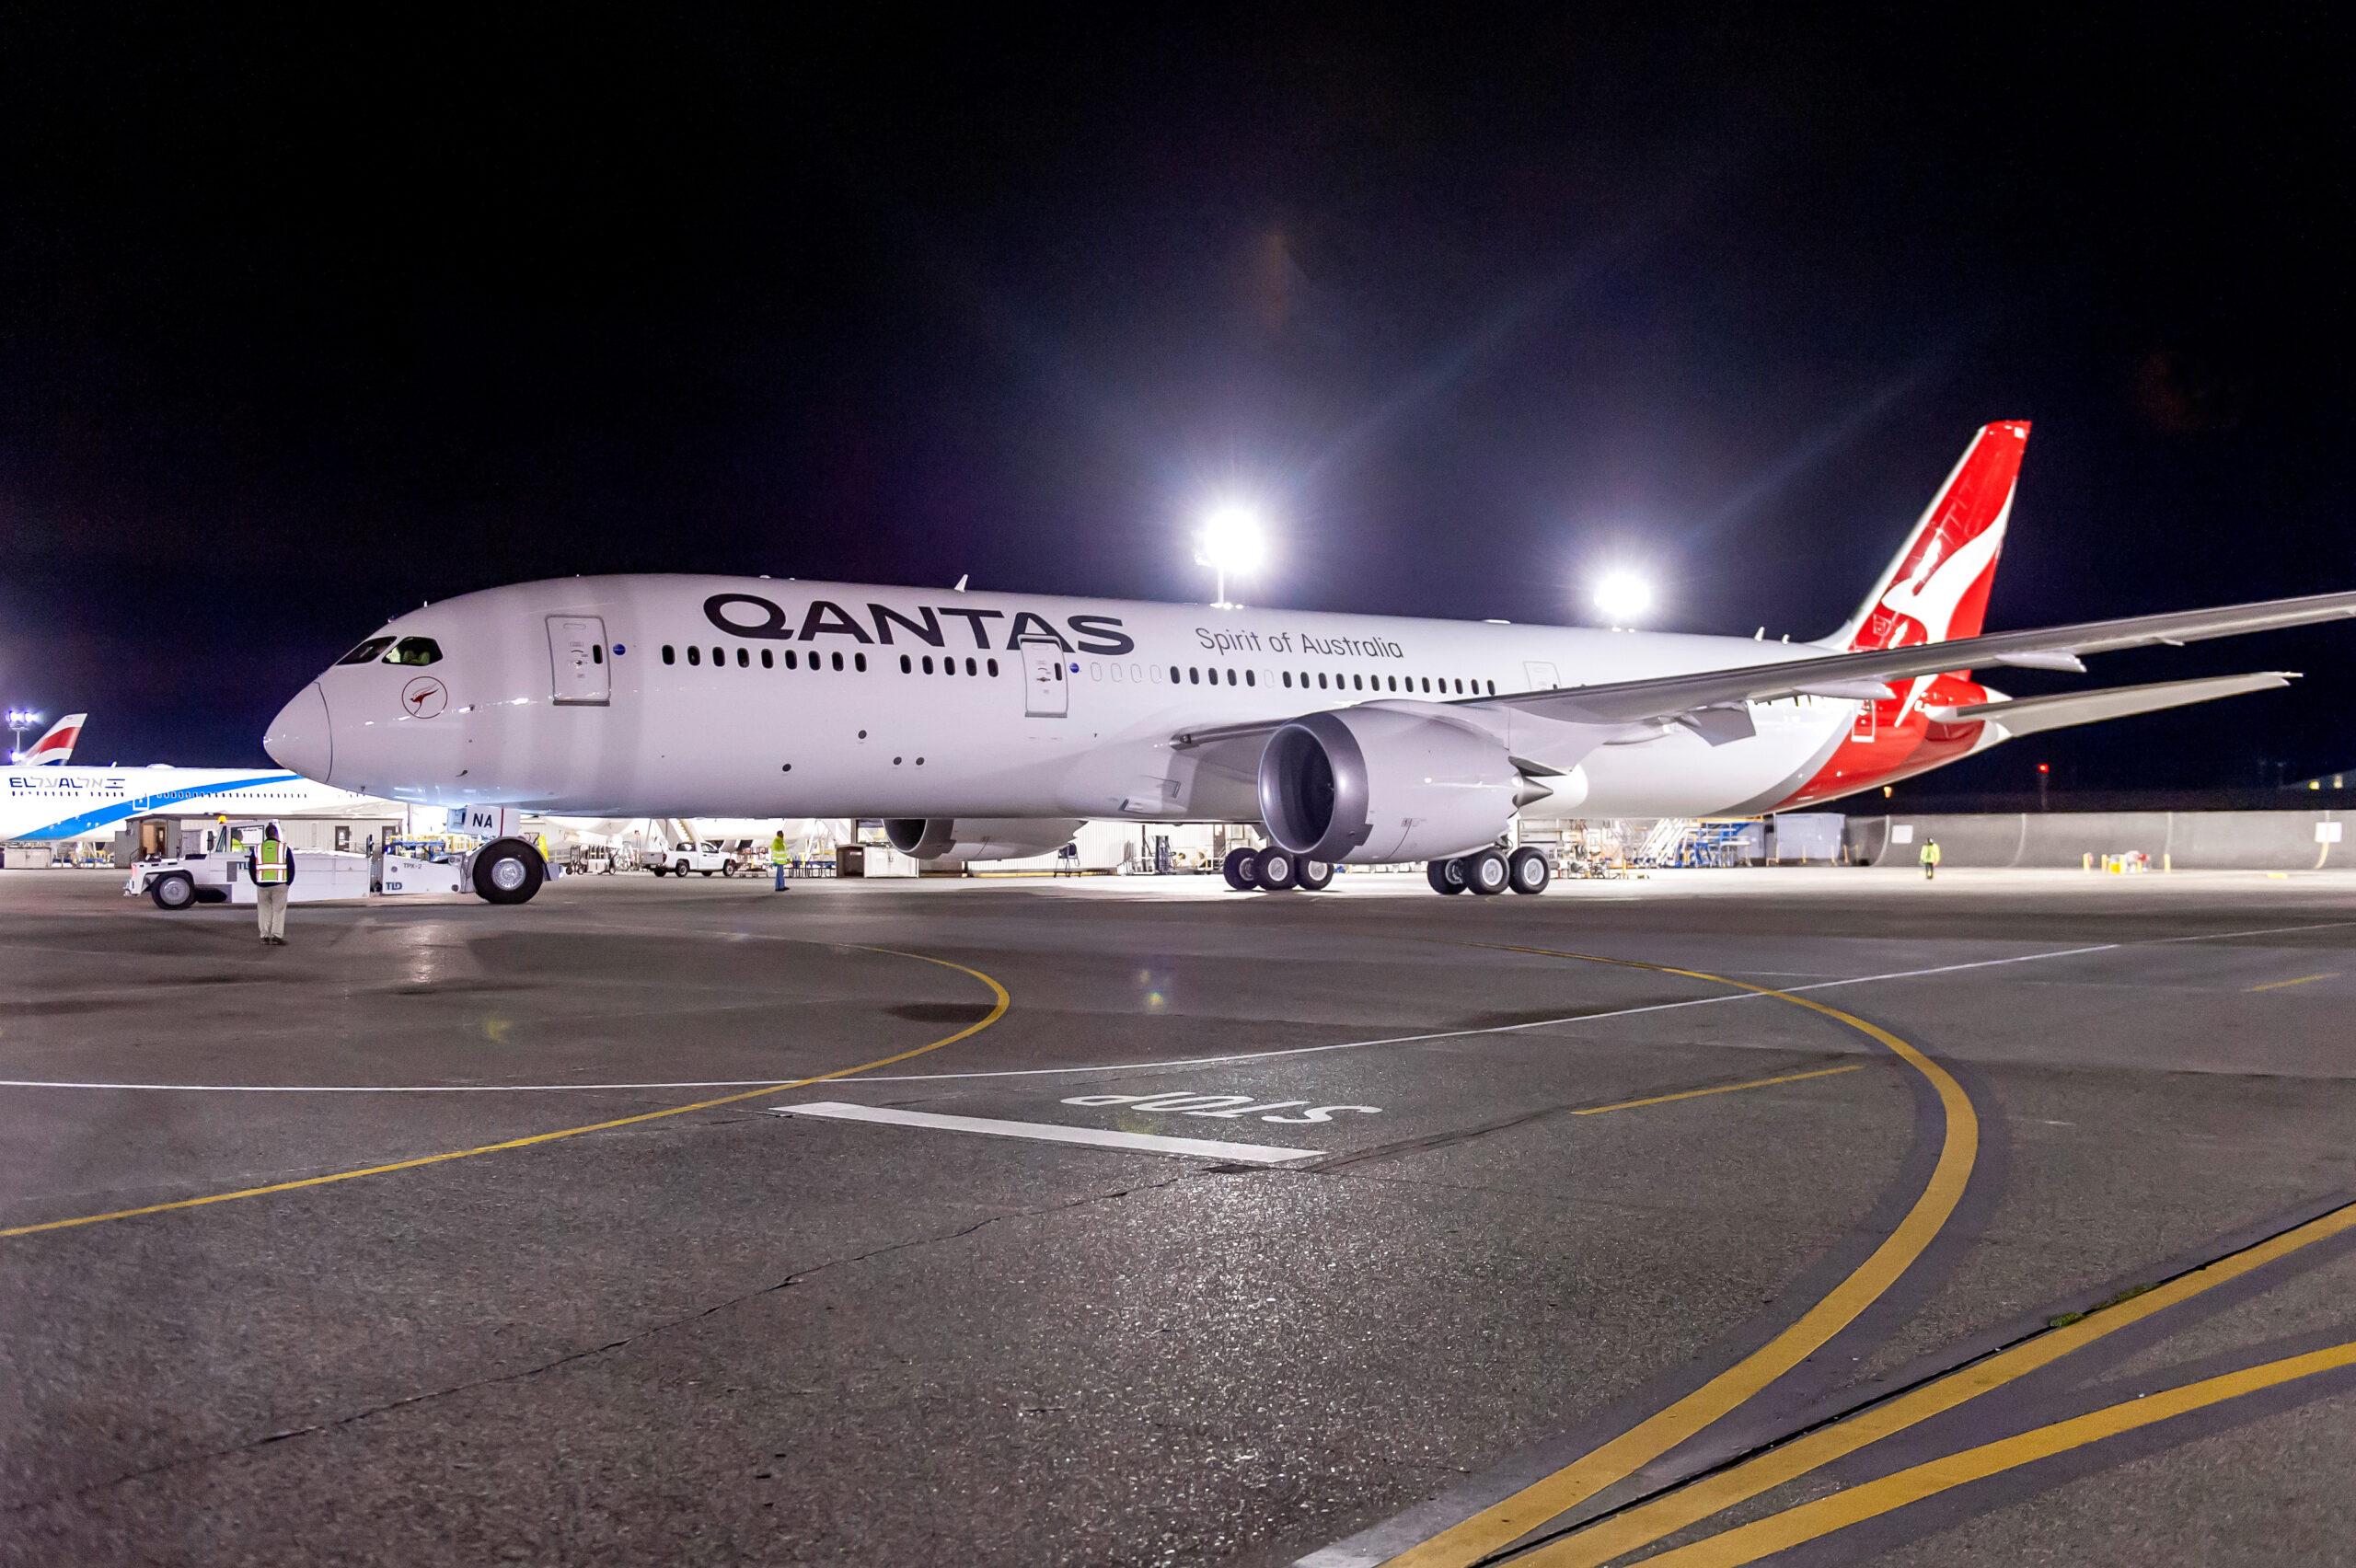 Qantas B787 Dreamliner